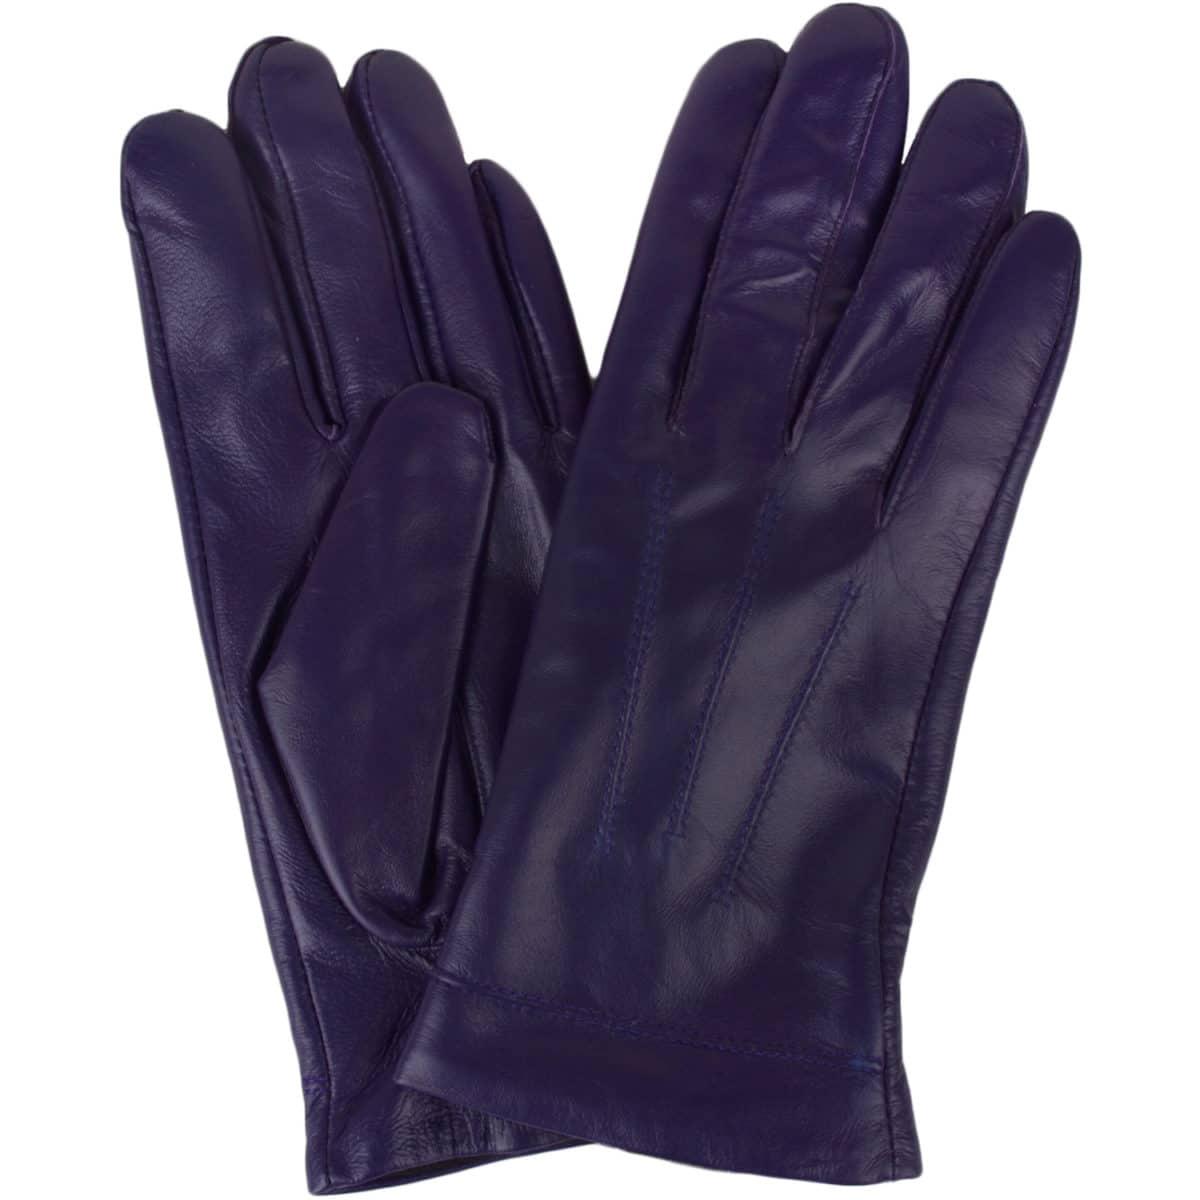 Mavis - Leather Gloves Three Point Stitch - Purple